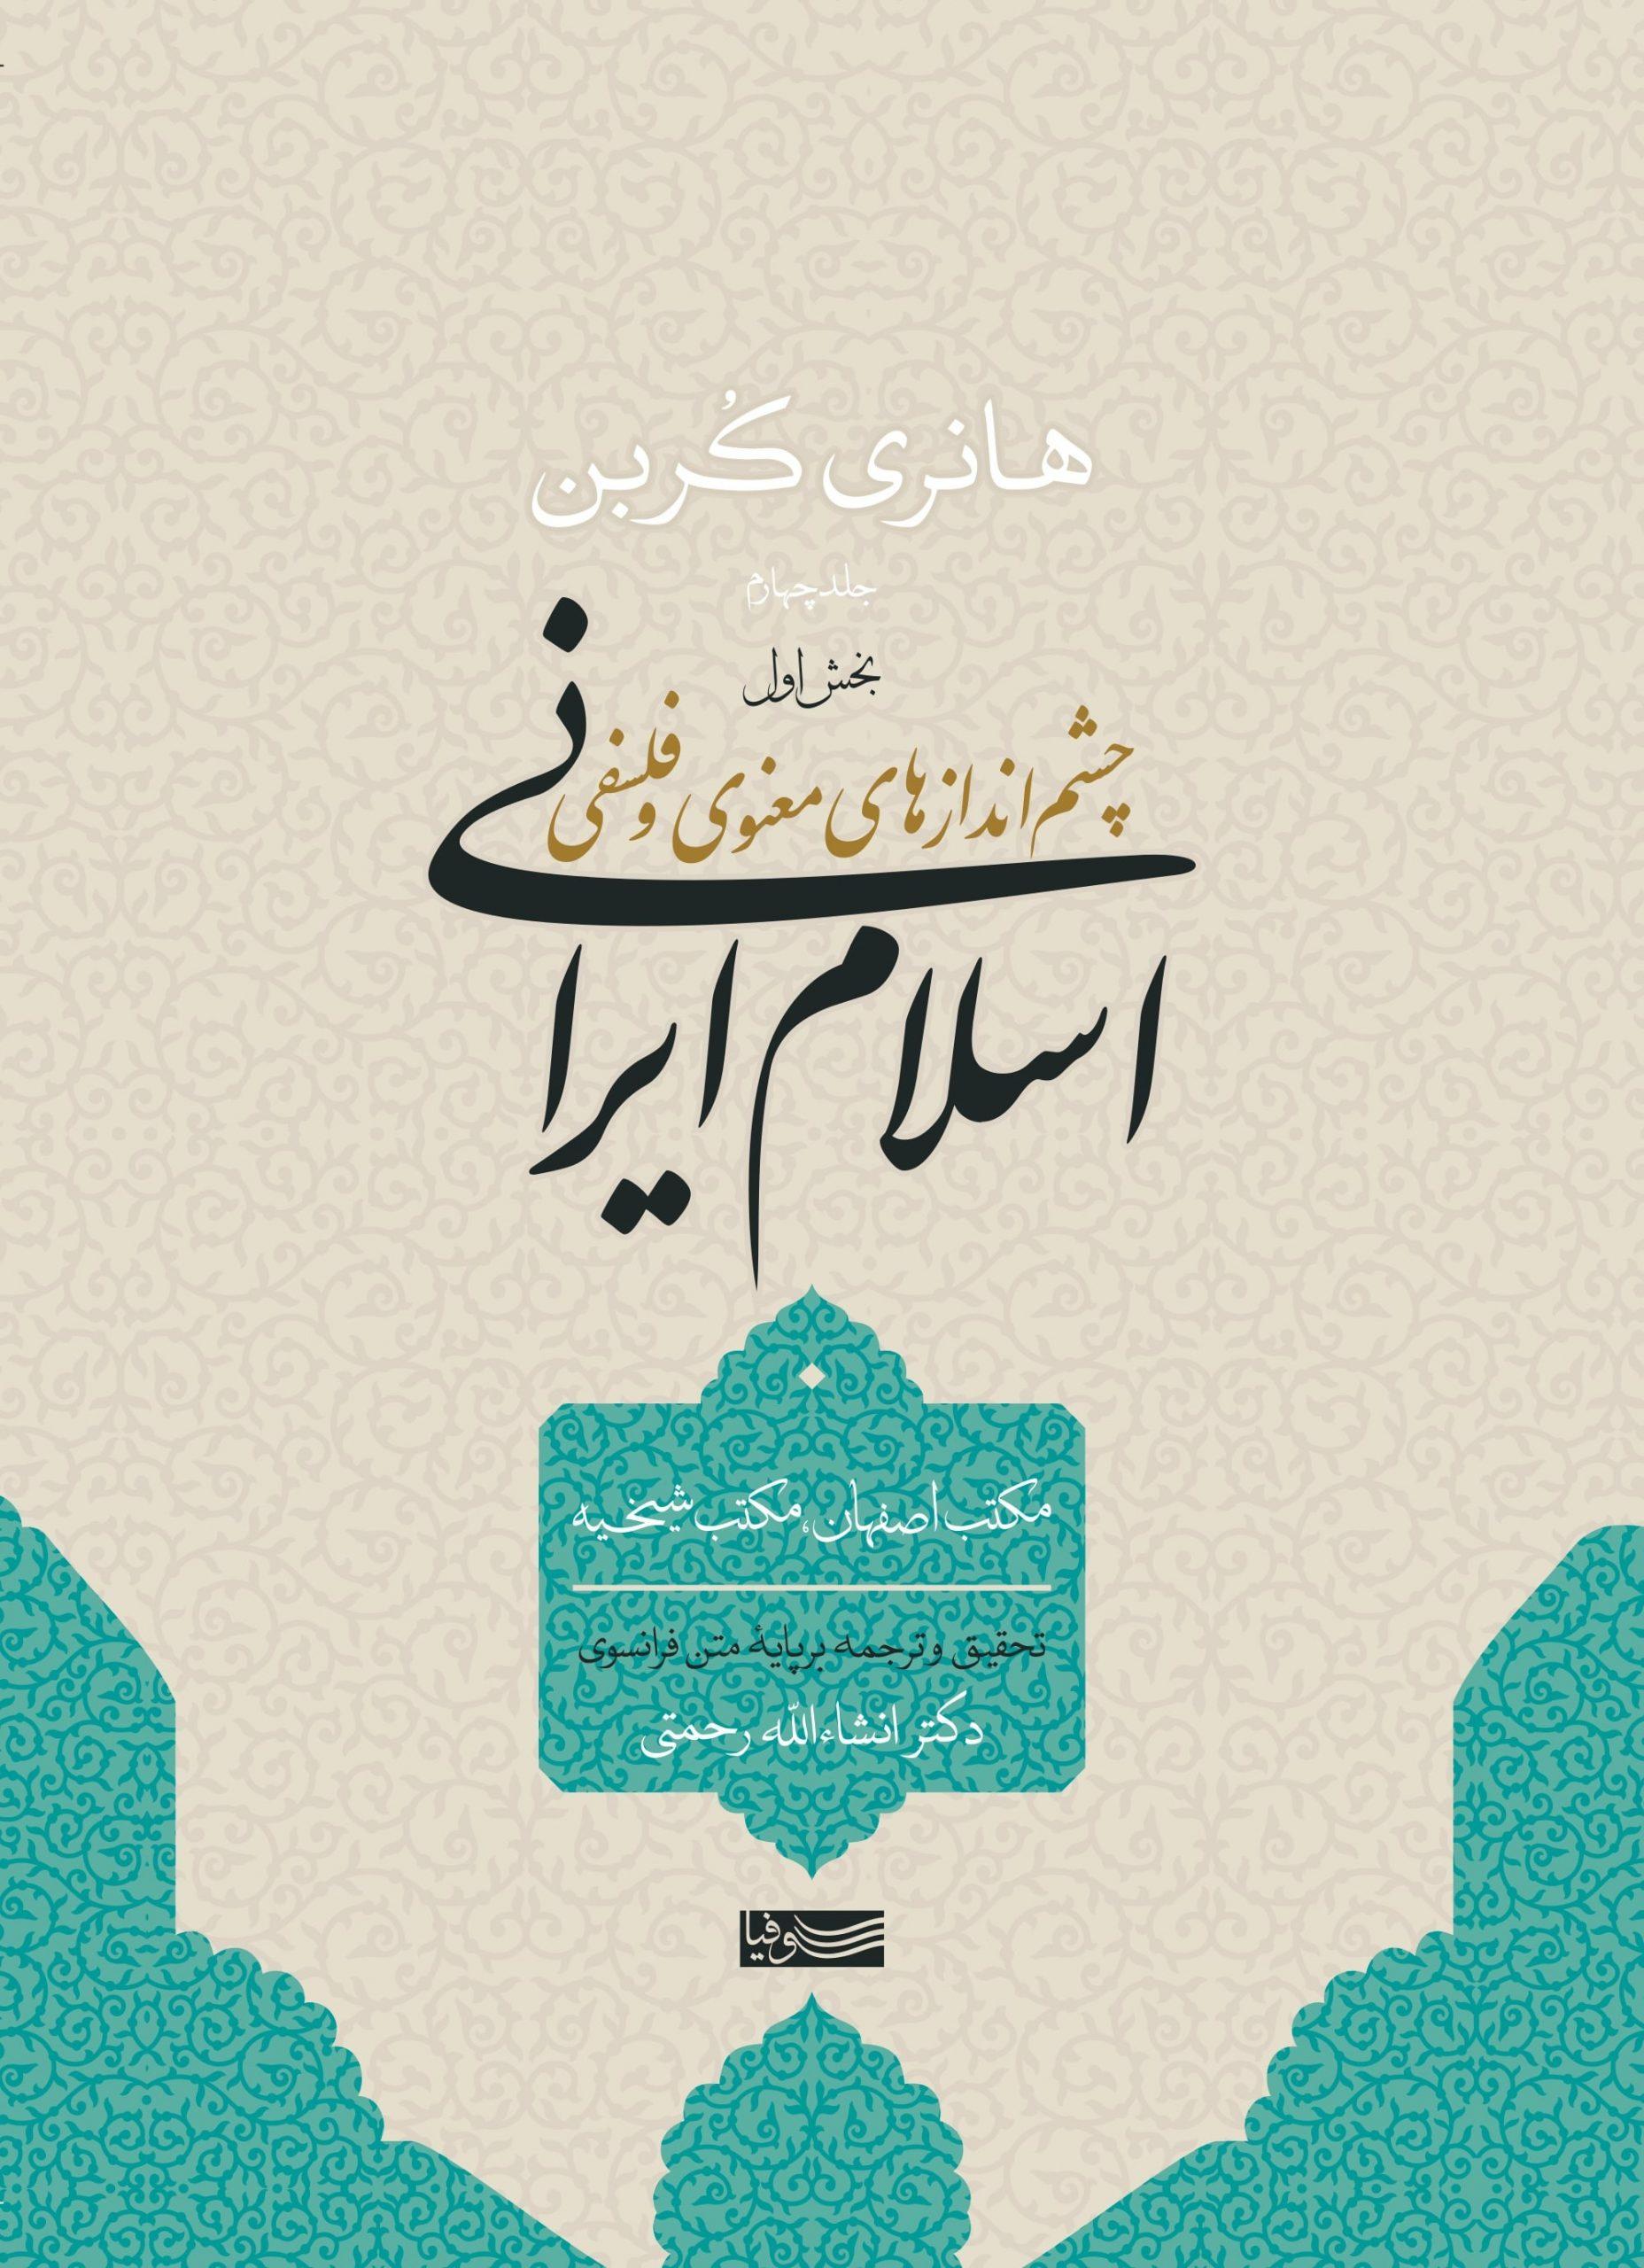 ESLAM-e-IRANI-v4-aval-ORIG-98-04-09-min